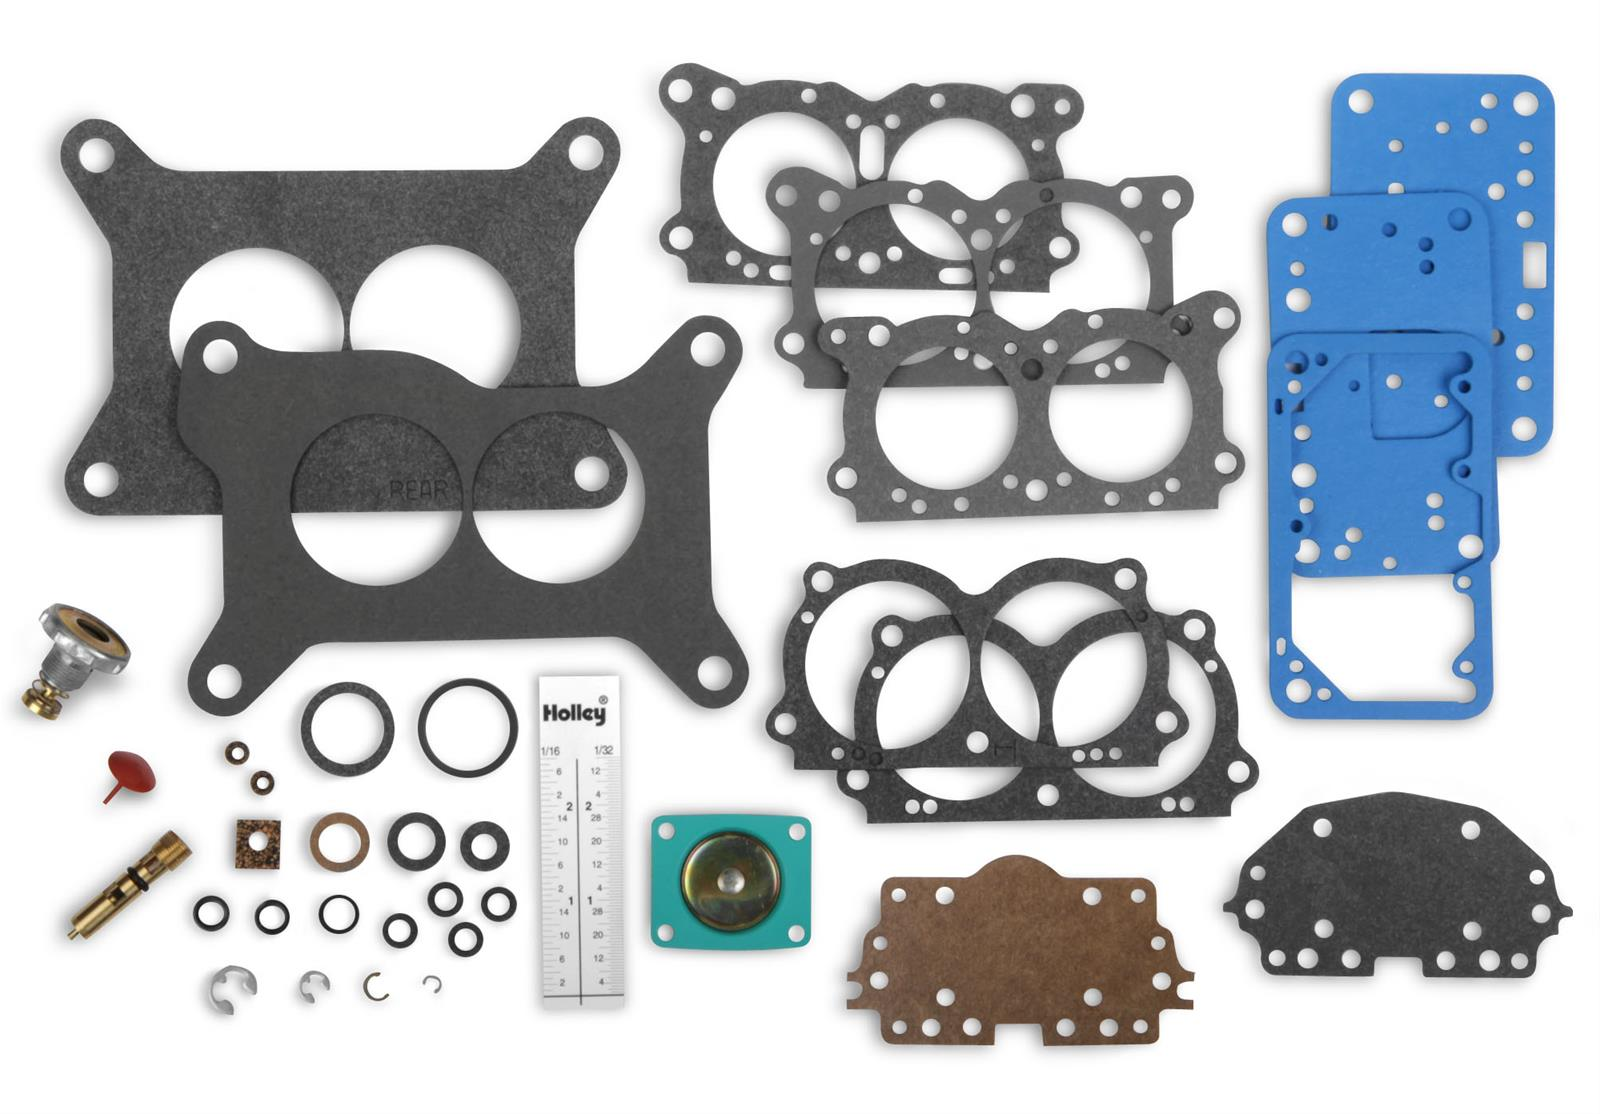 Holley 37-1543 Fast Kit Carburetor Rebuild Kit